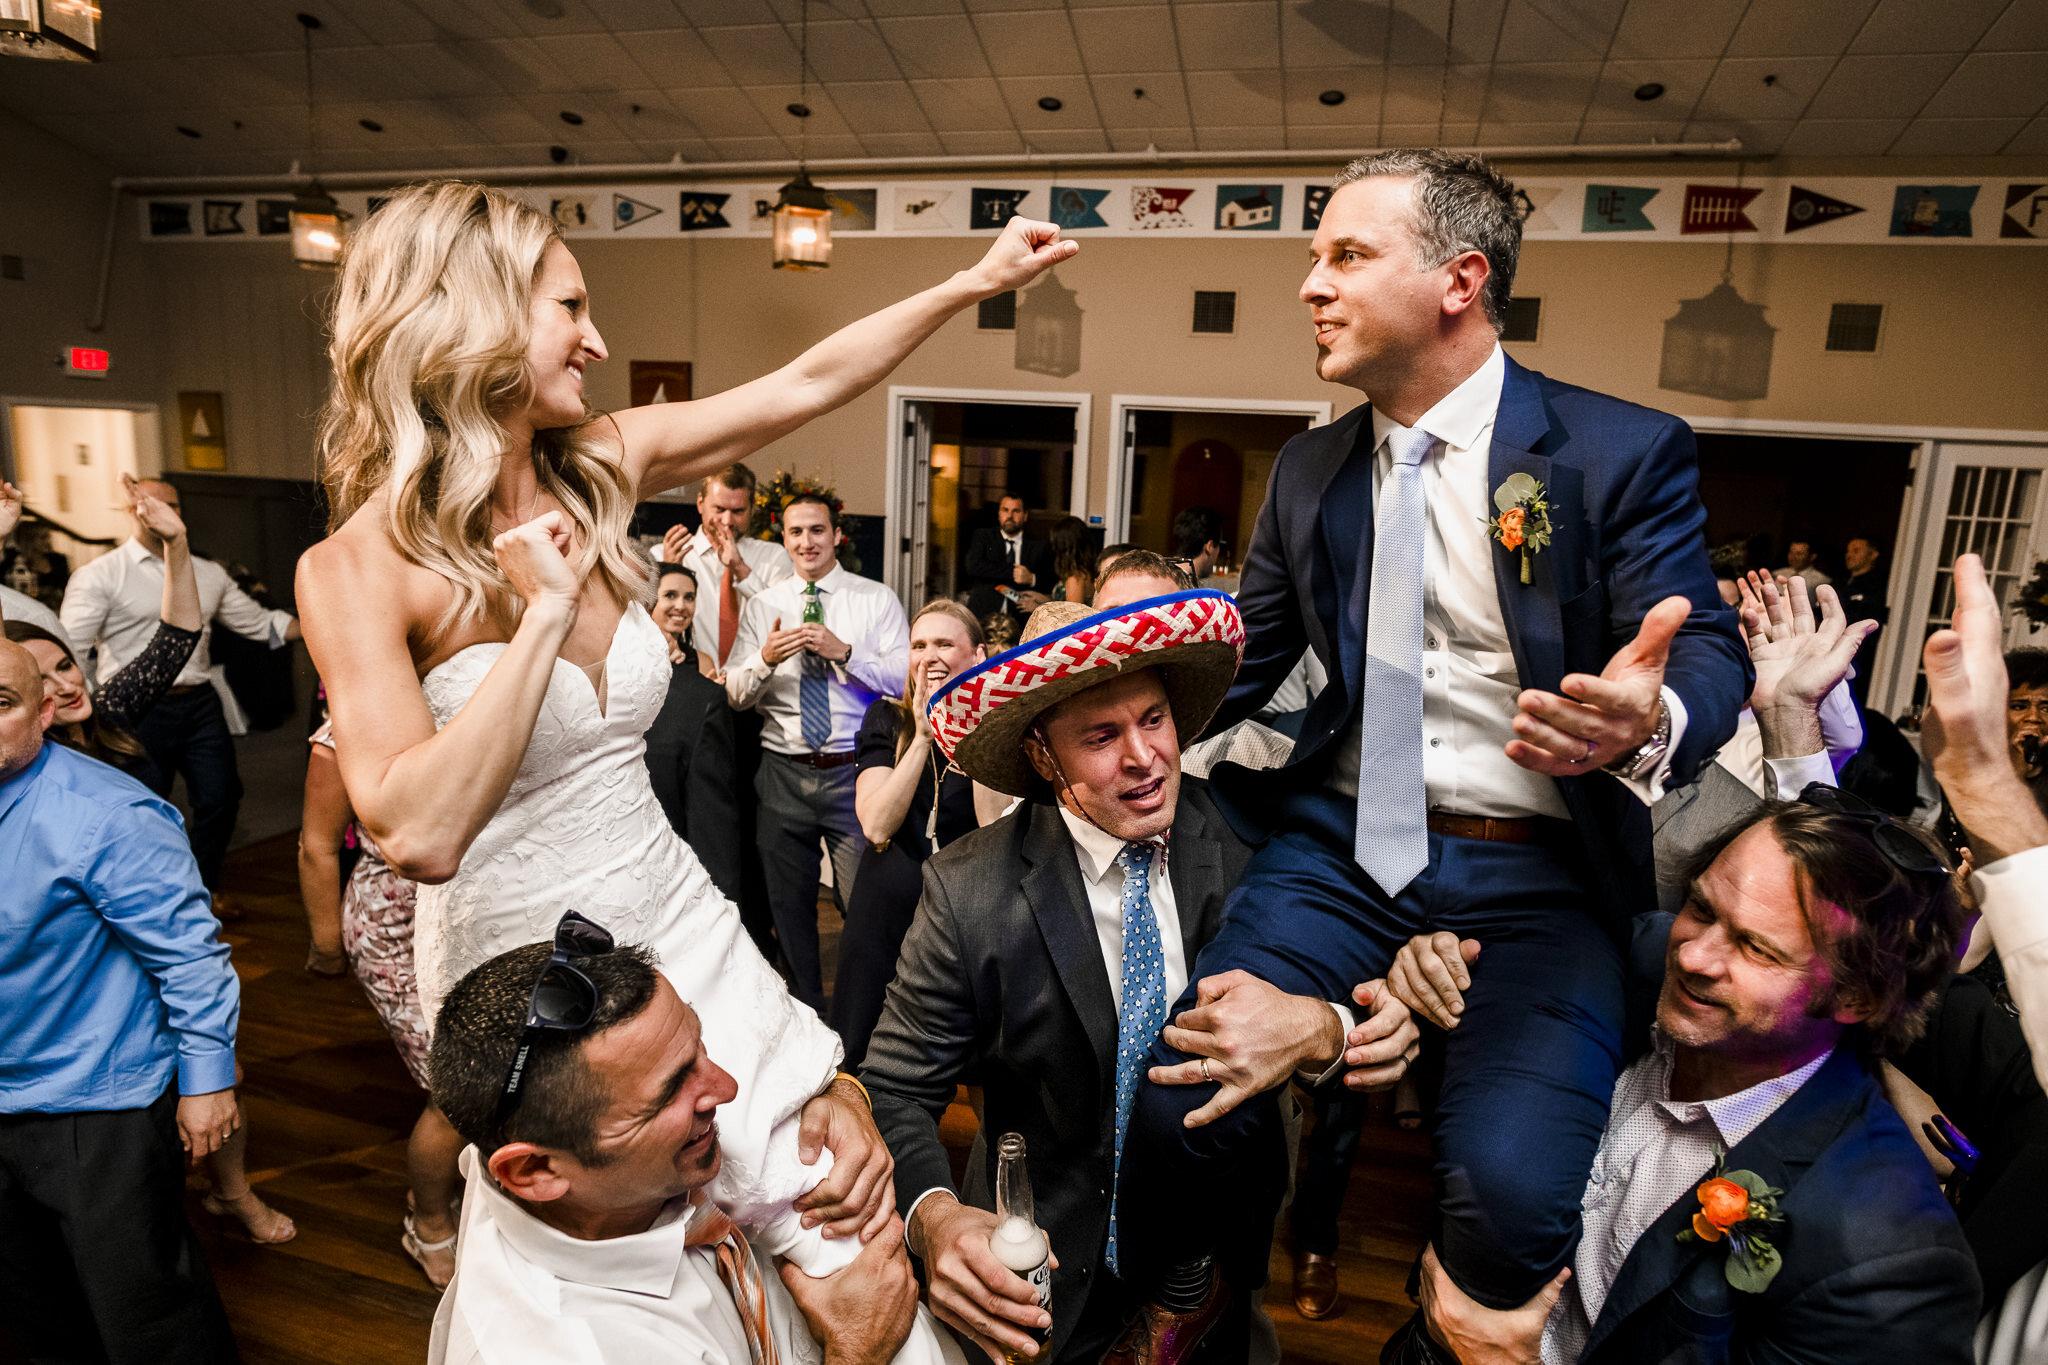 Snell-Ocean-City-Yacht-Club-New-Jersey-Wedding-Photographer-41.JPG